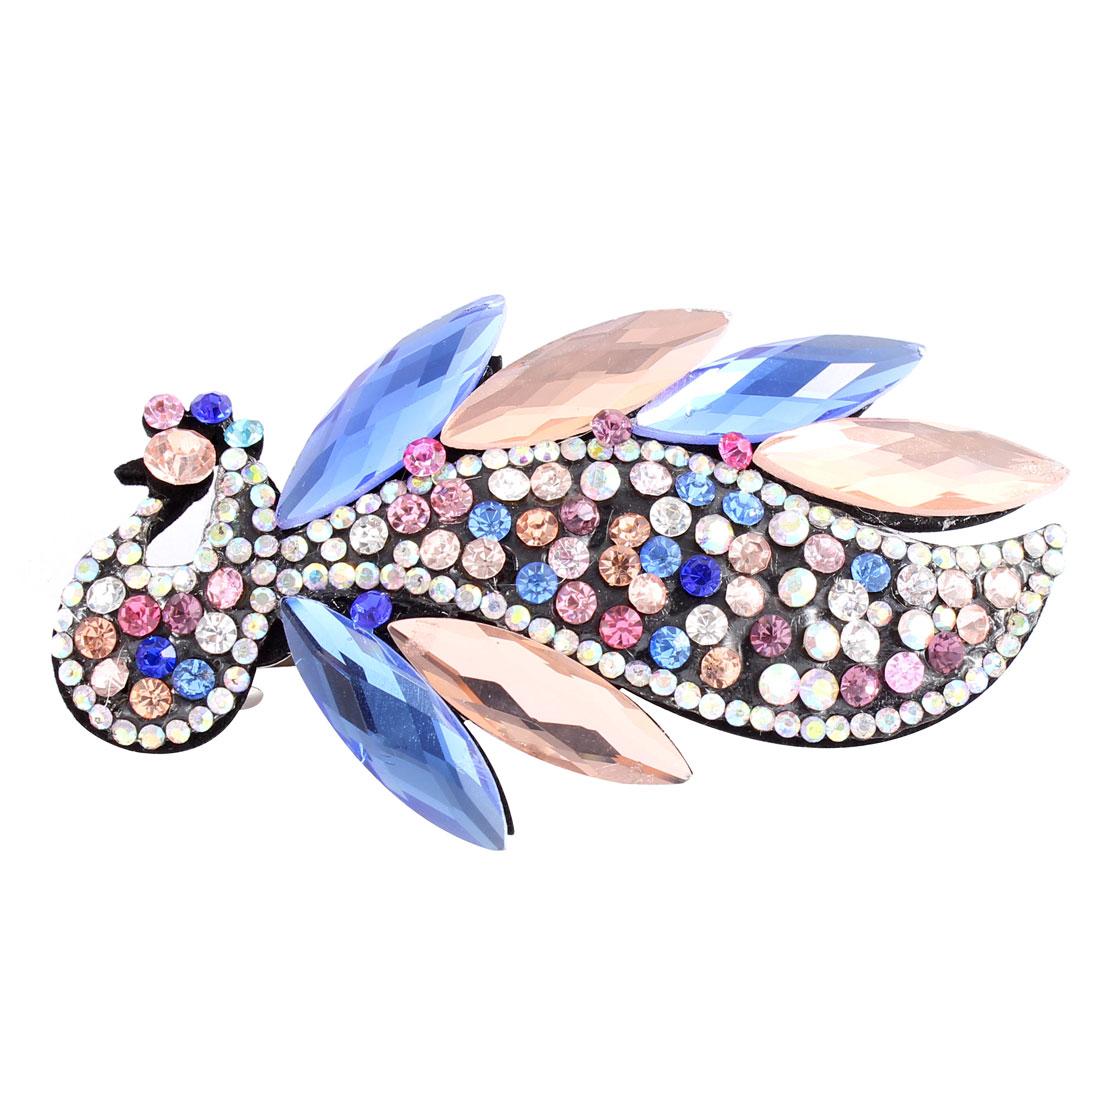 Multicolor Faux Rhinestone Crystal Decor Peacock Shape Barrette Hairclip for Woman